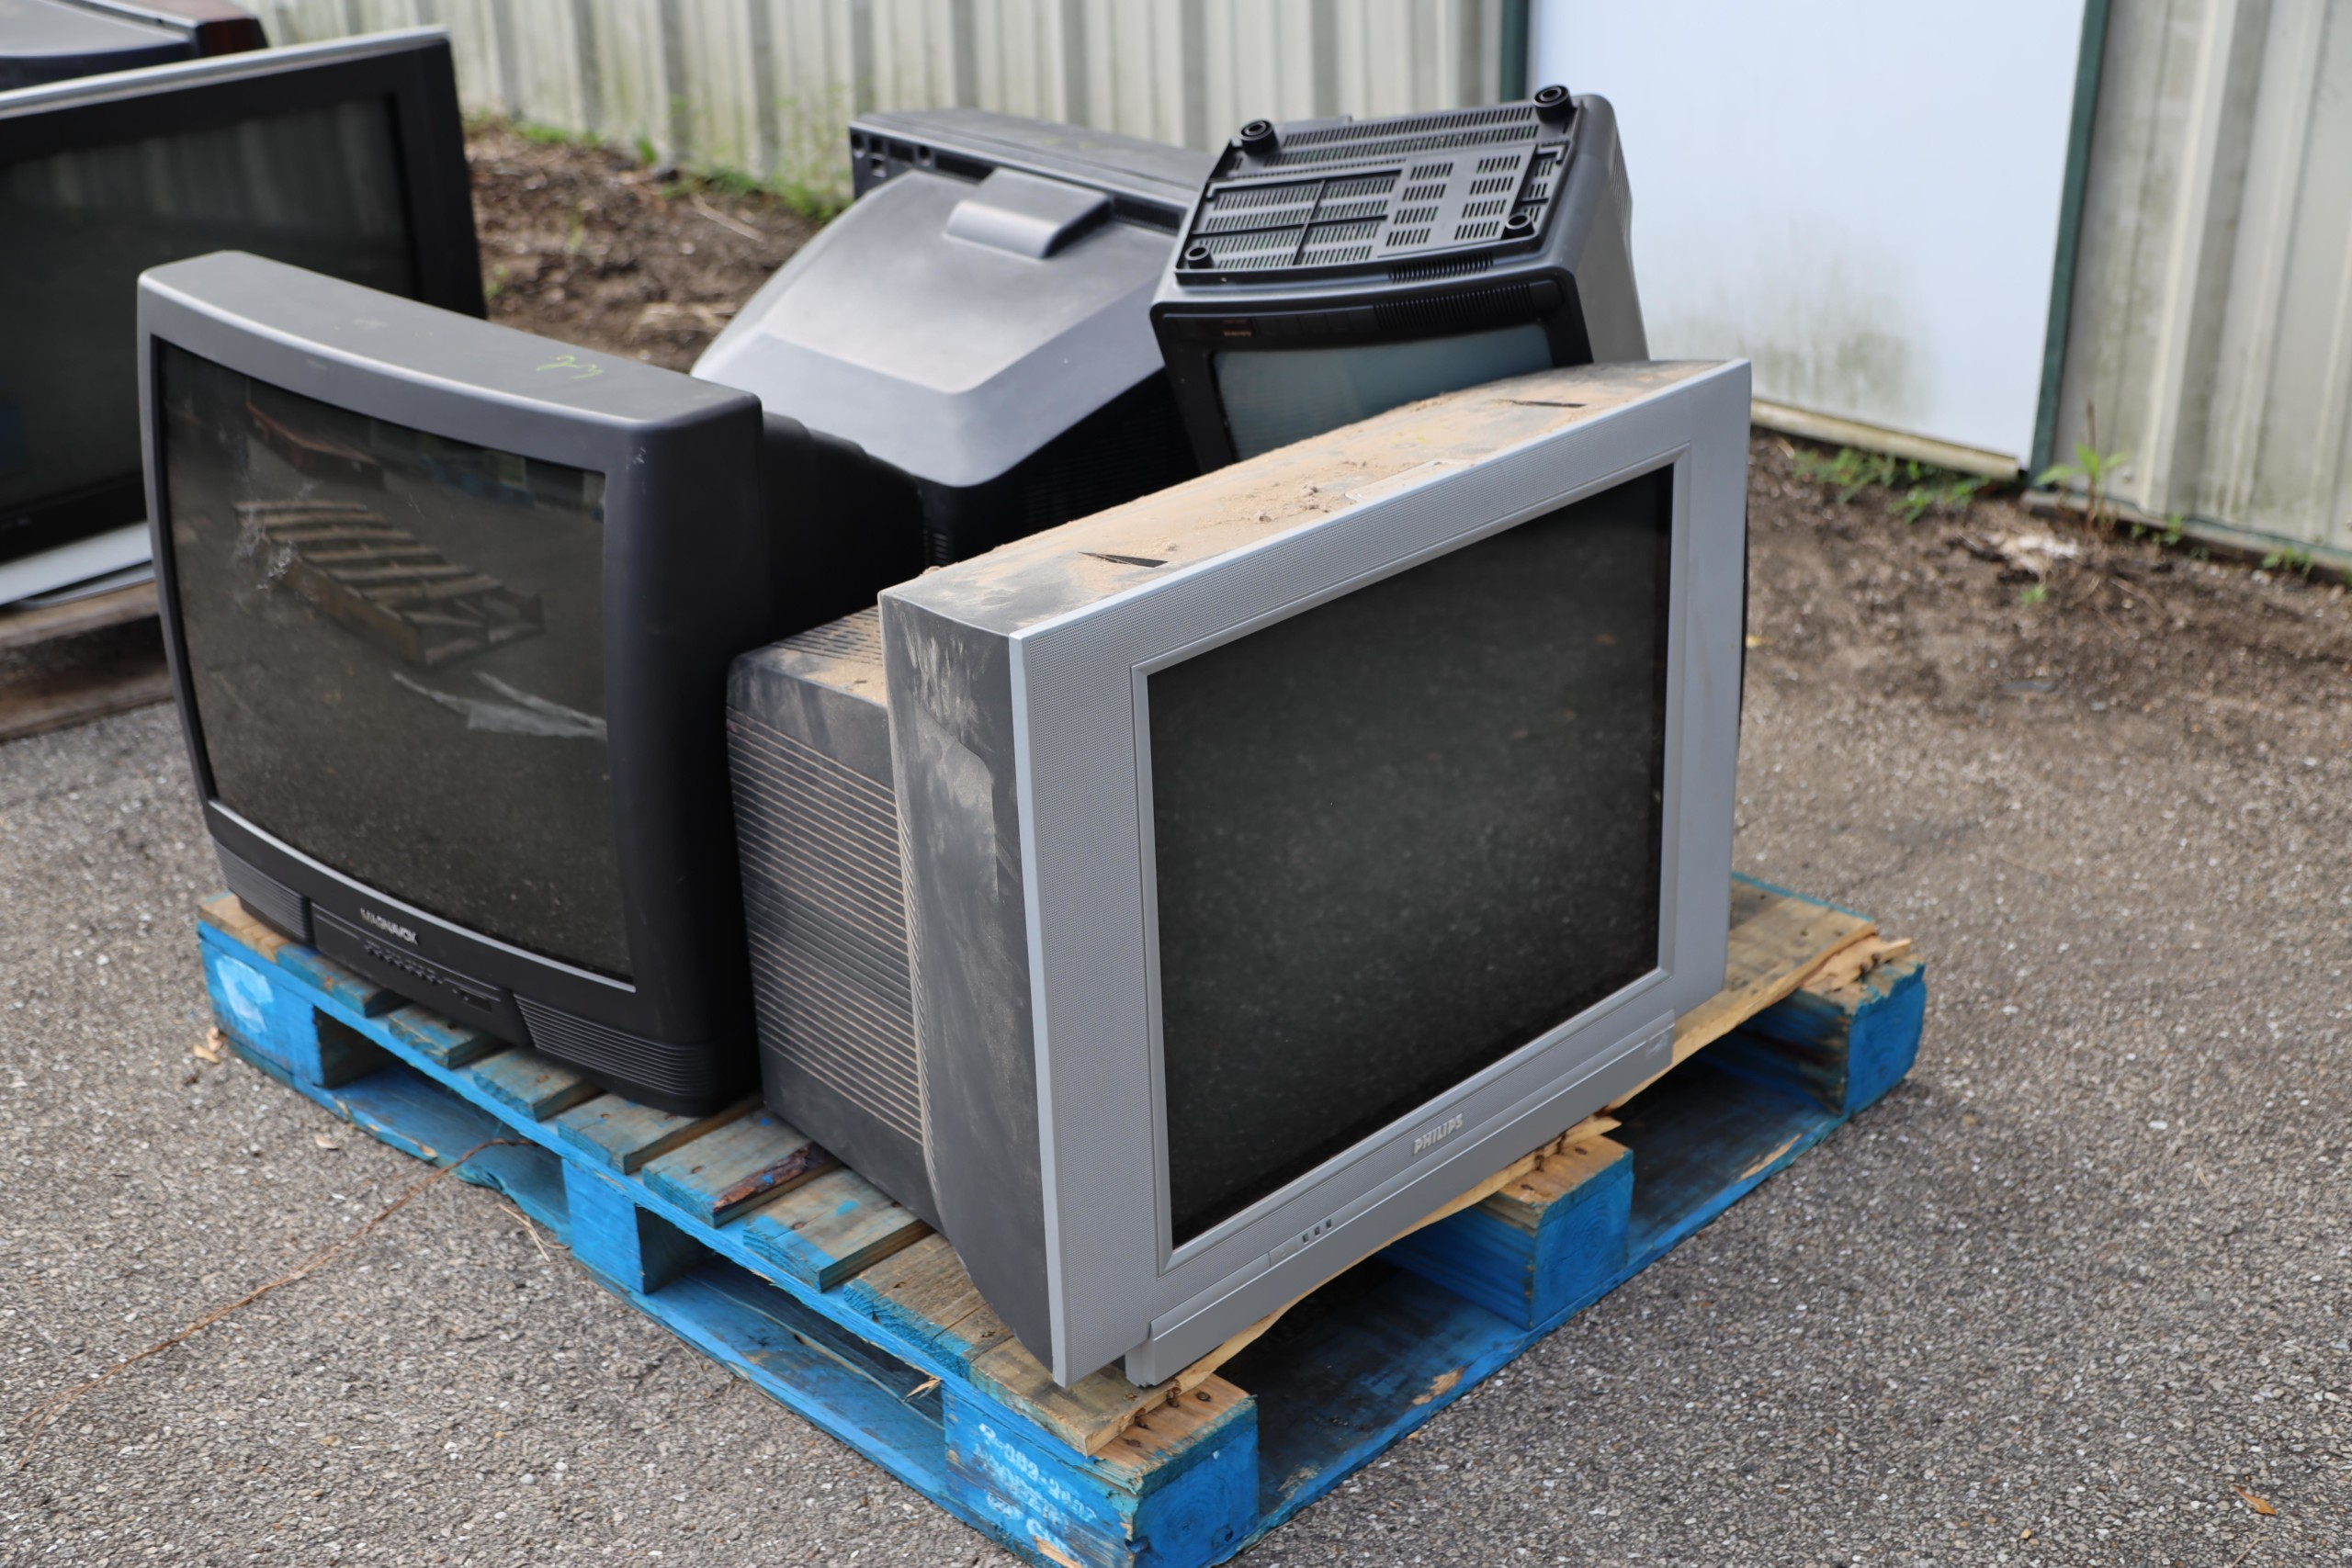 Old TVs on a pallet